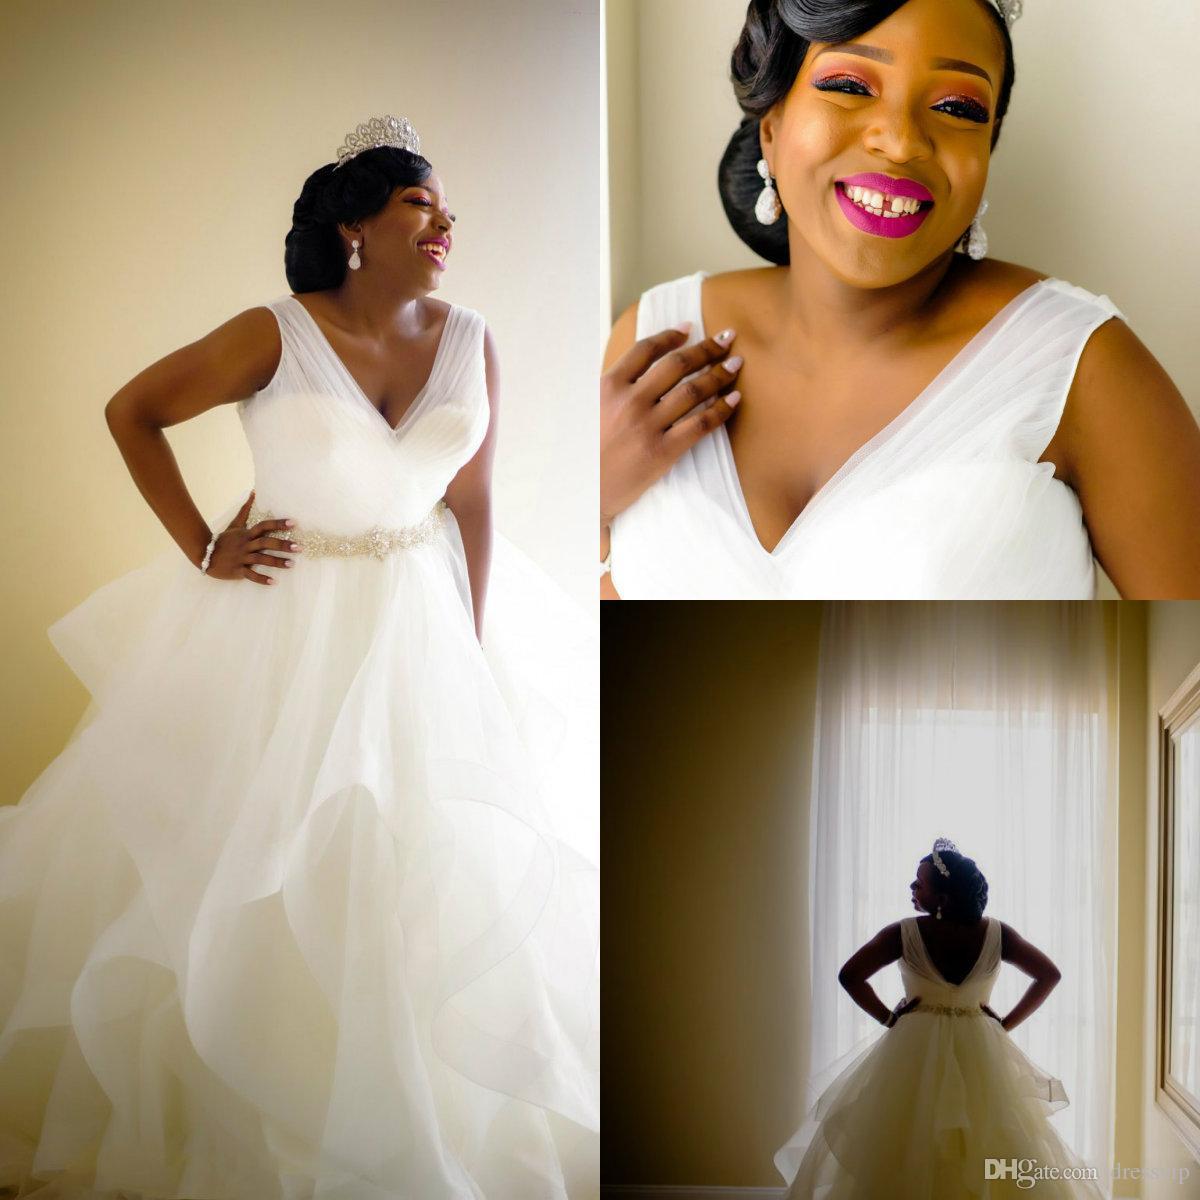 2018 Plus Size Wedding Dresses With Belt A Line V Neck Sleeveless Luxury  Ruffles Beach Bridal Gowns robe de mariée Boho Wedding Dress